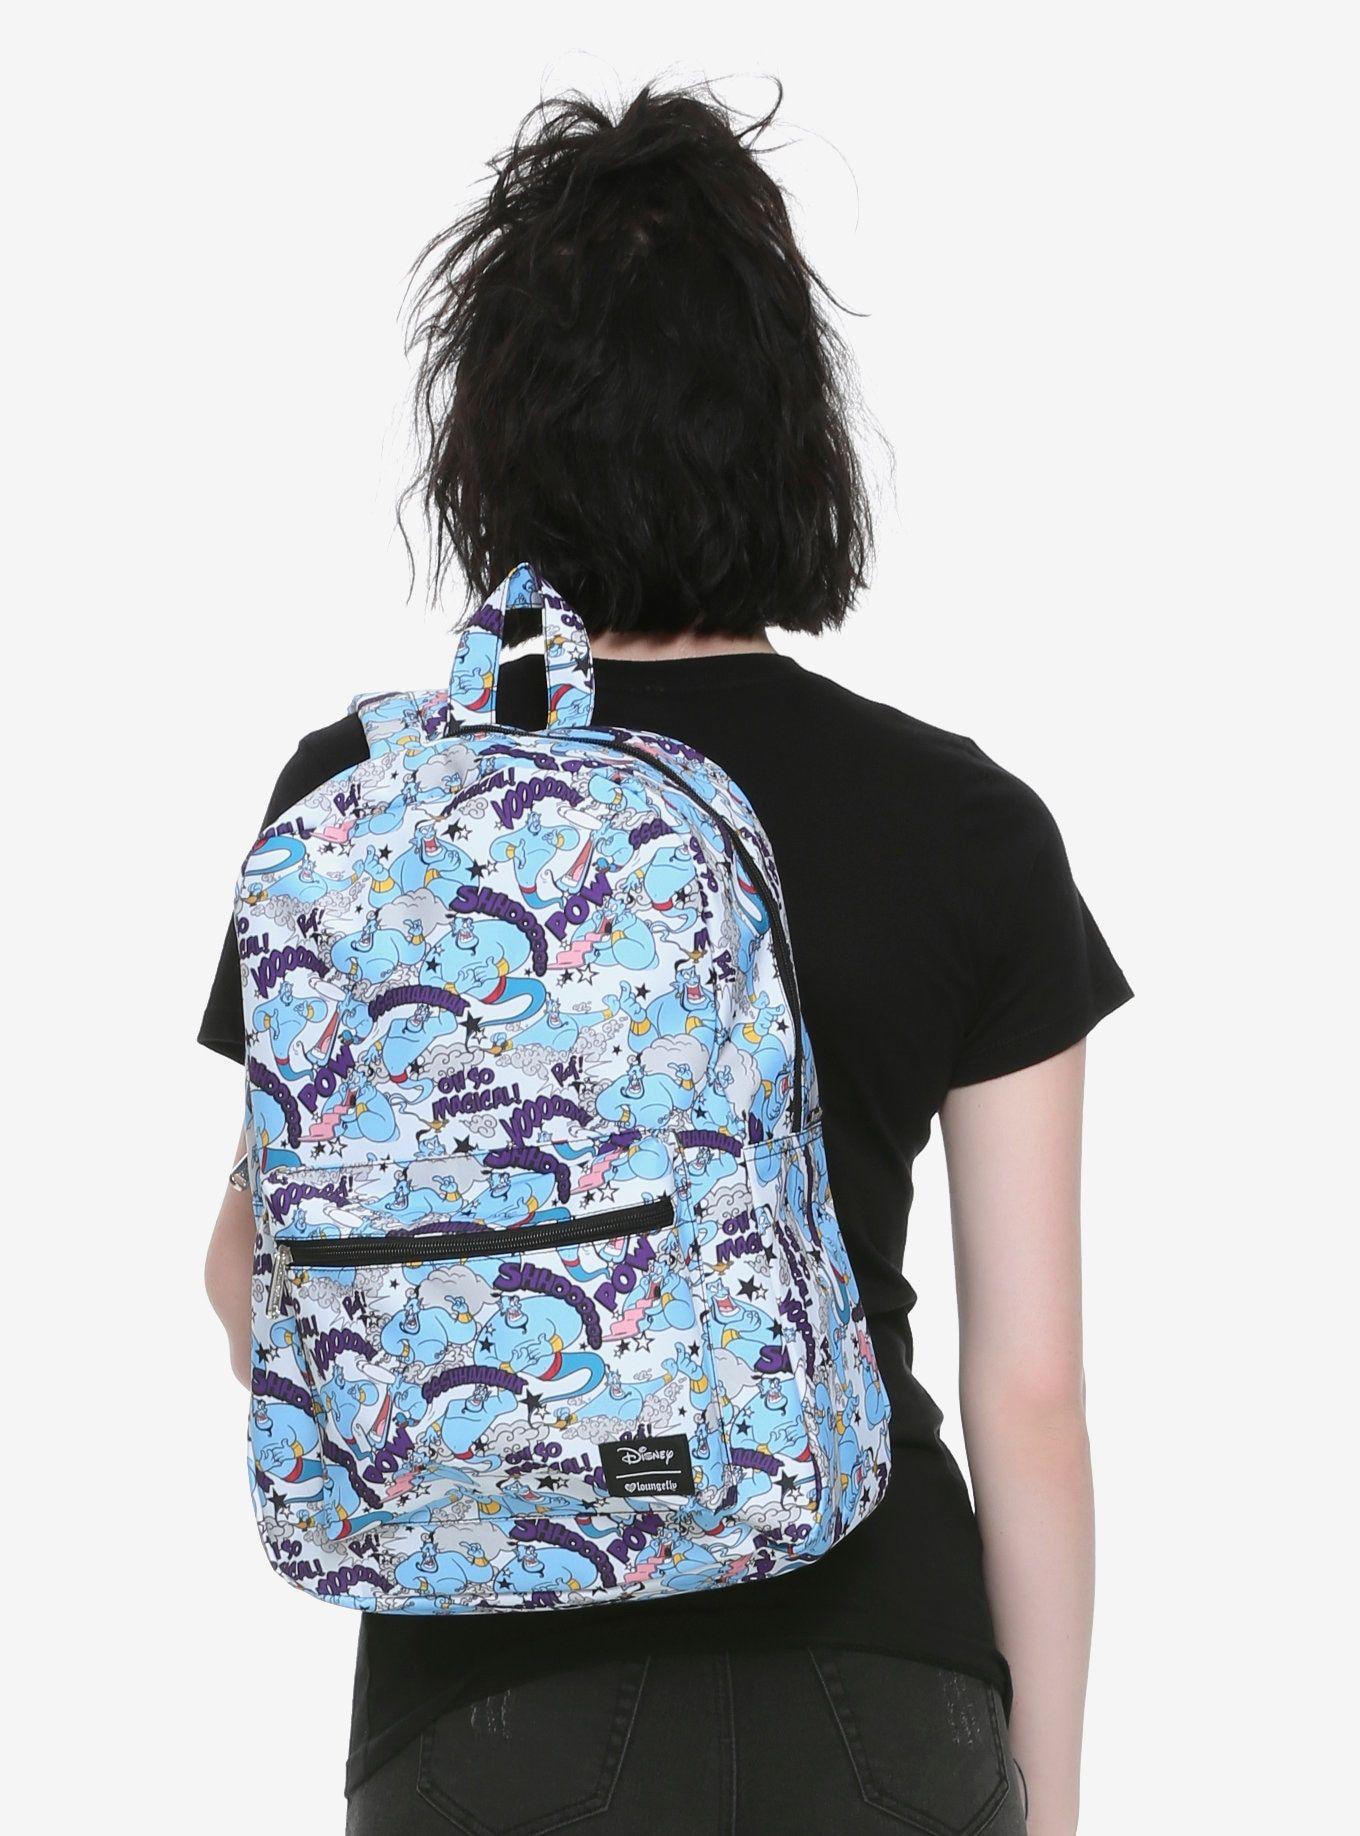 d15612b51d5 Loungefly Disney Aladdin Genie Backpack